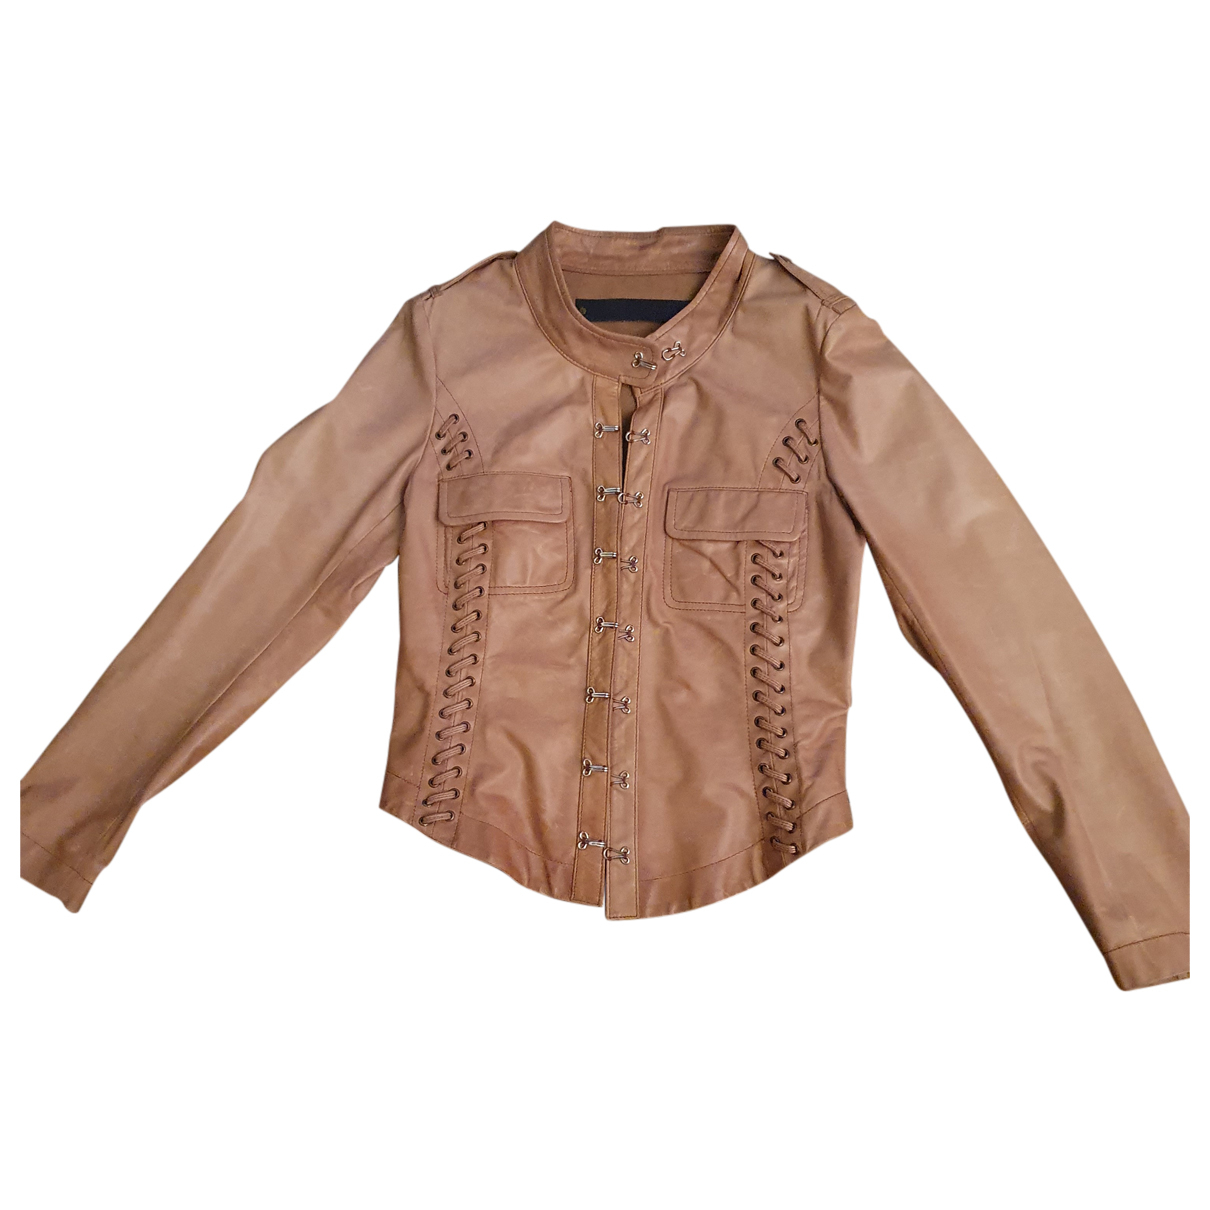 Barbara Bui N Beige Leather jacket for Women 38 FR